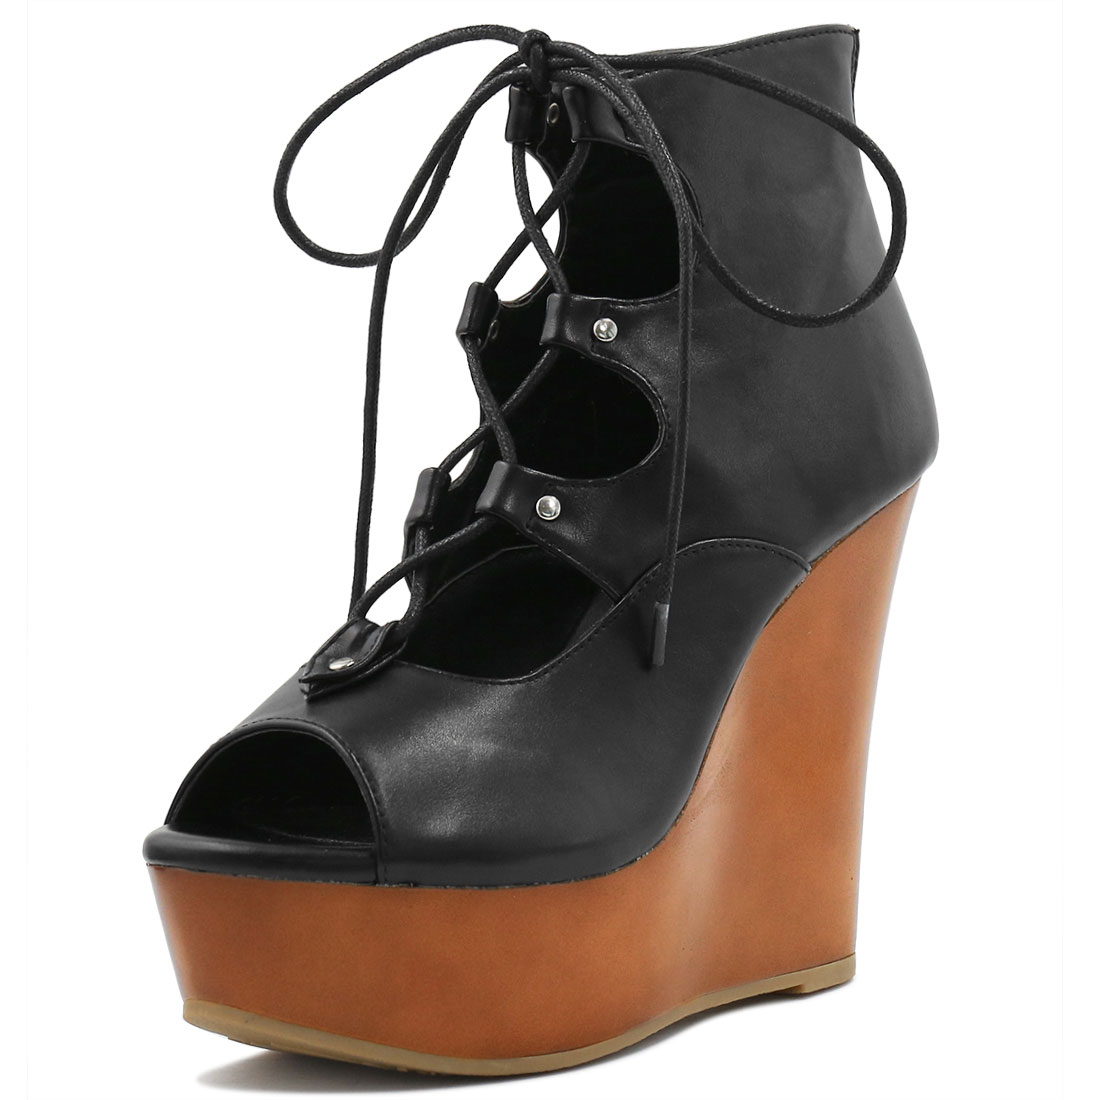 Woman Peep Toe Lace-Up Cutout Platform Wedge Sandals Black US 9